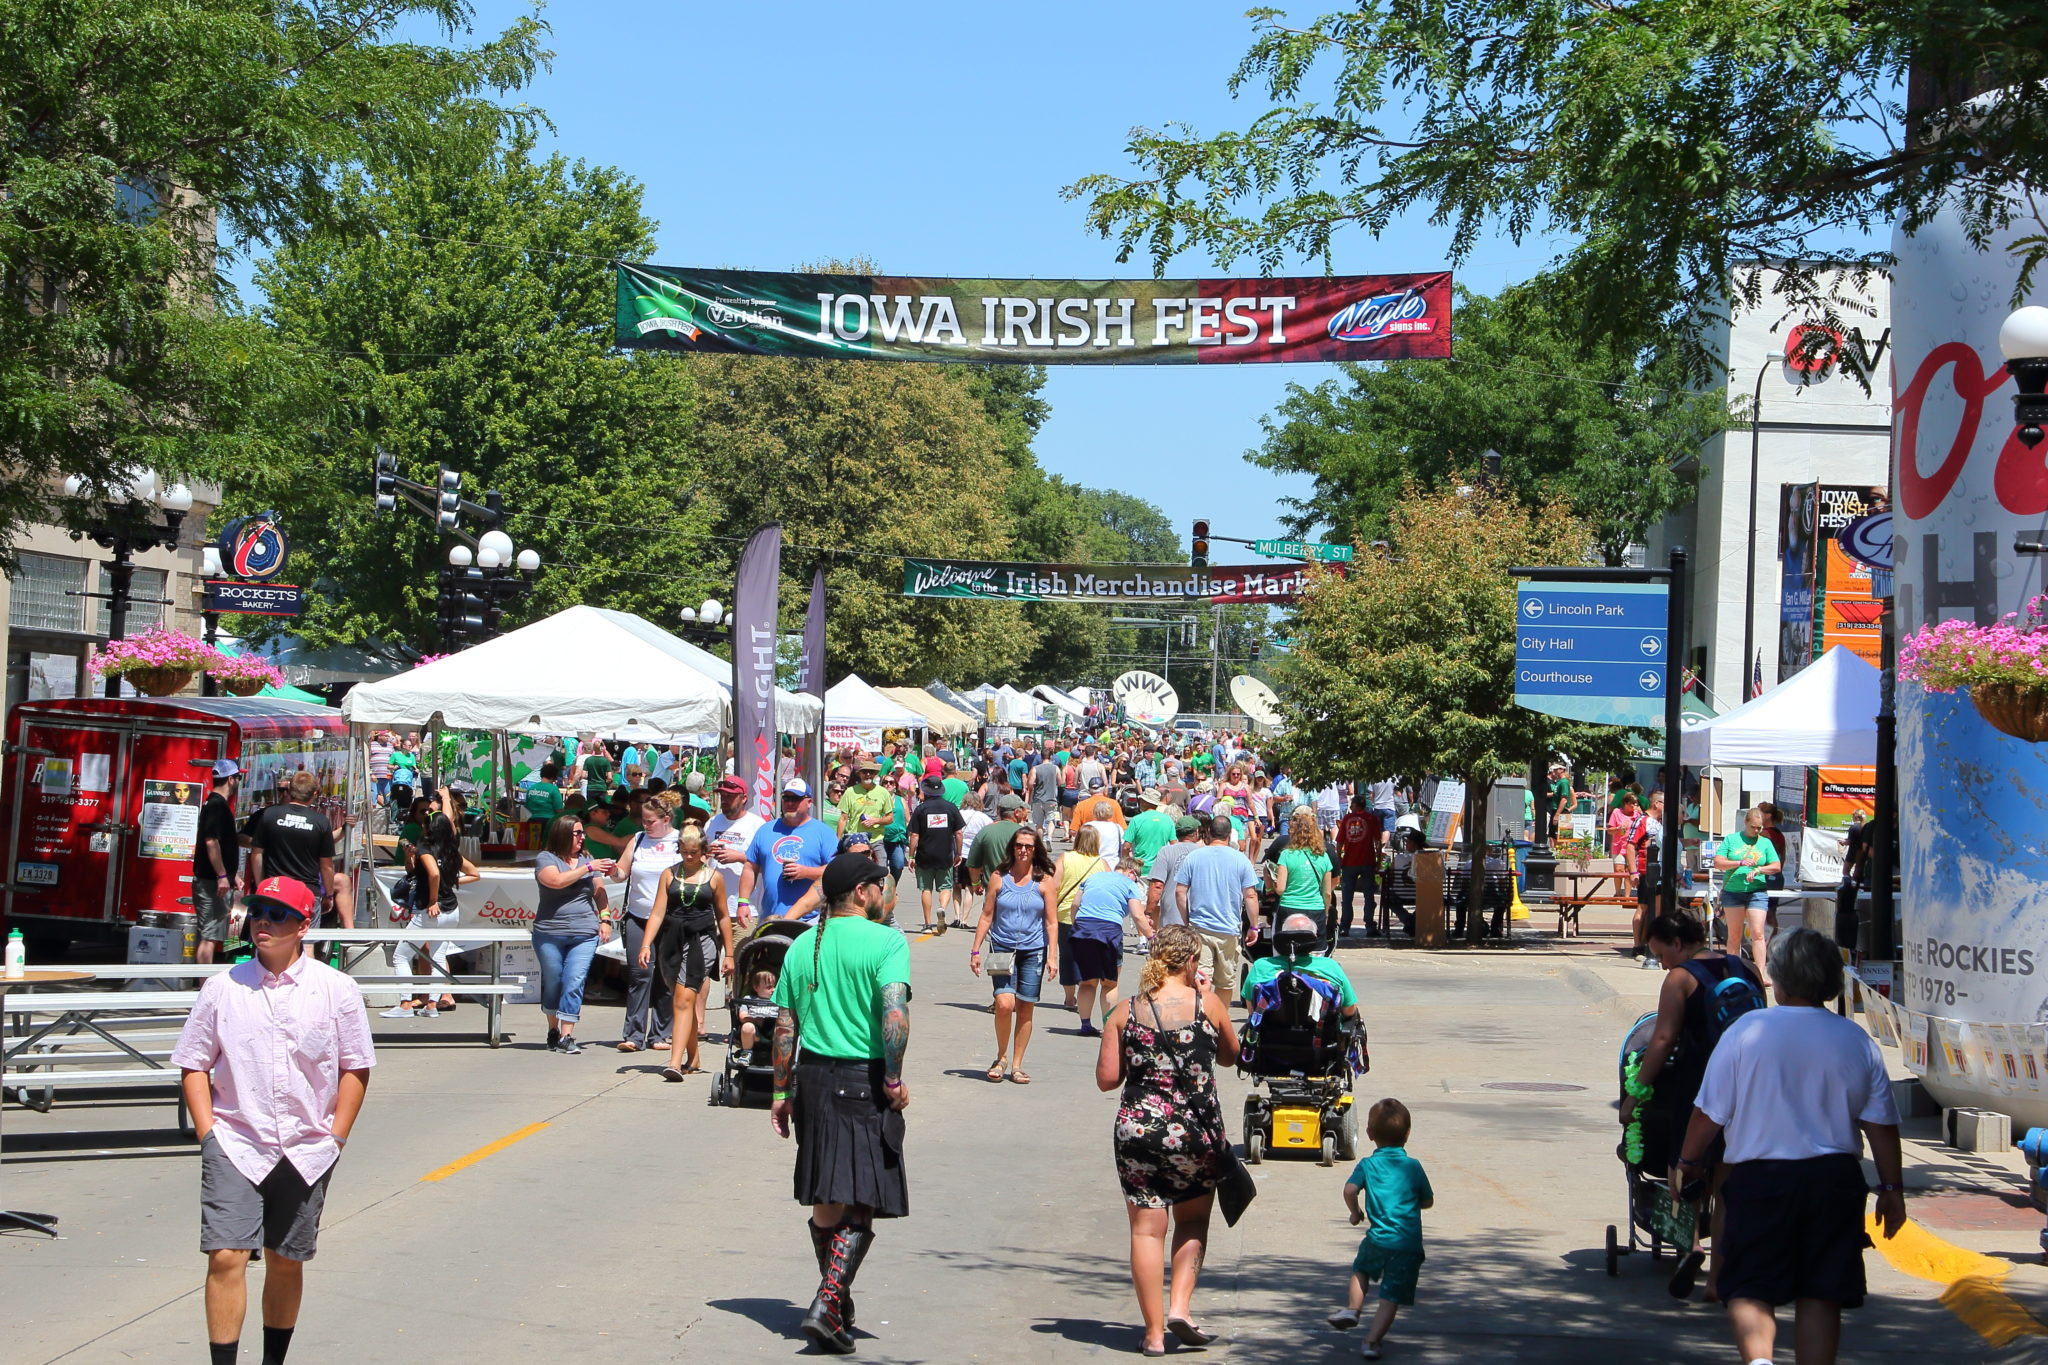 People enjoying Iowa Irish Fest in downtown Waterloo Iowa in the Cedar Valley.